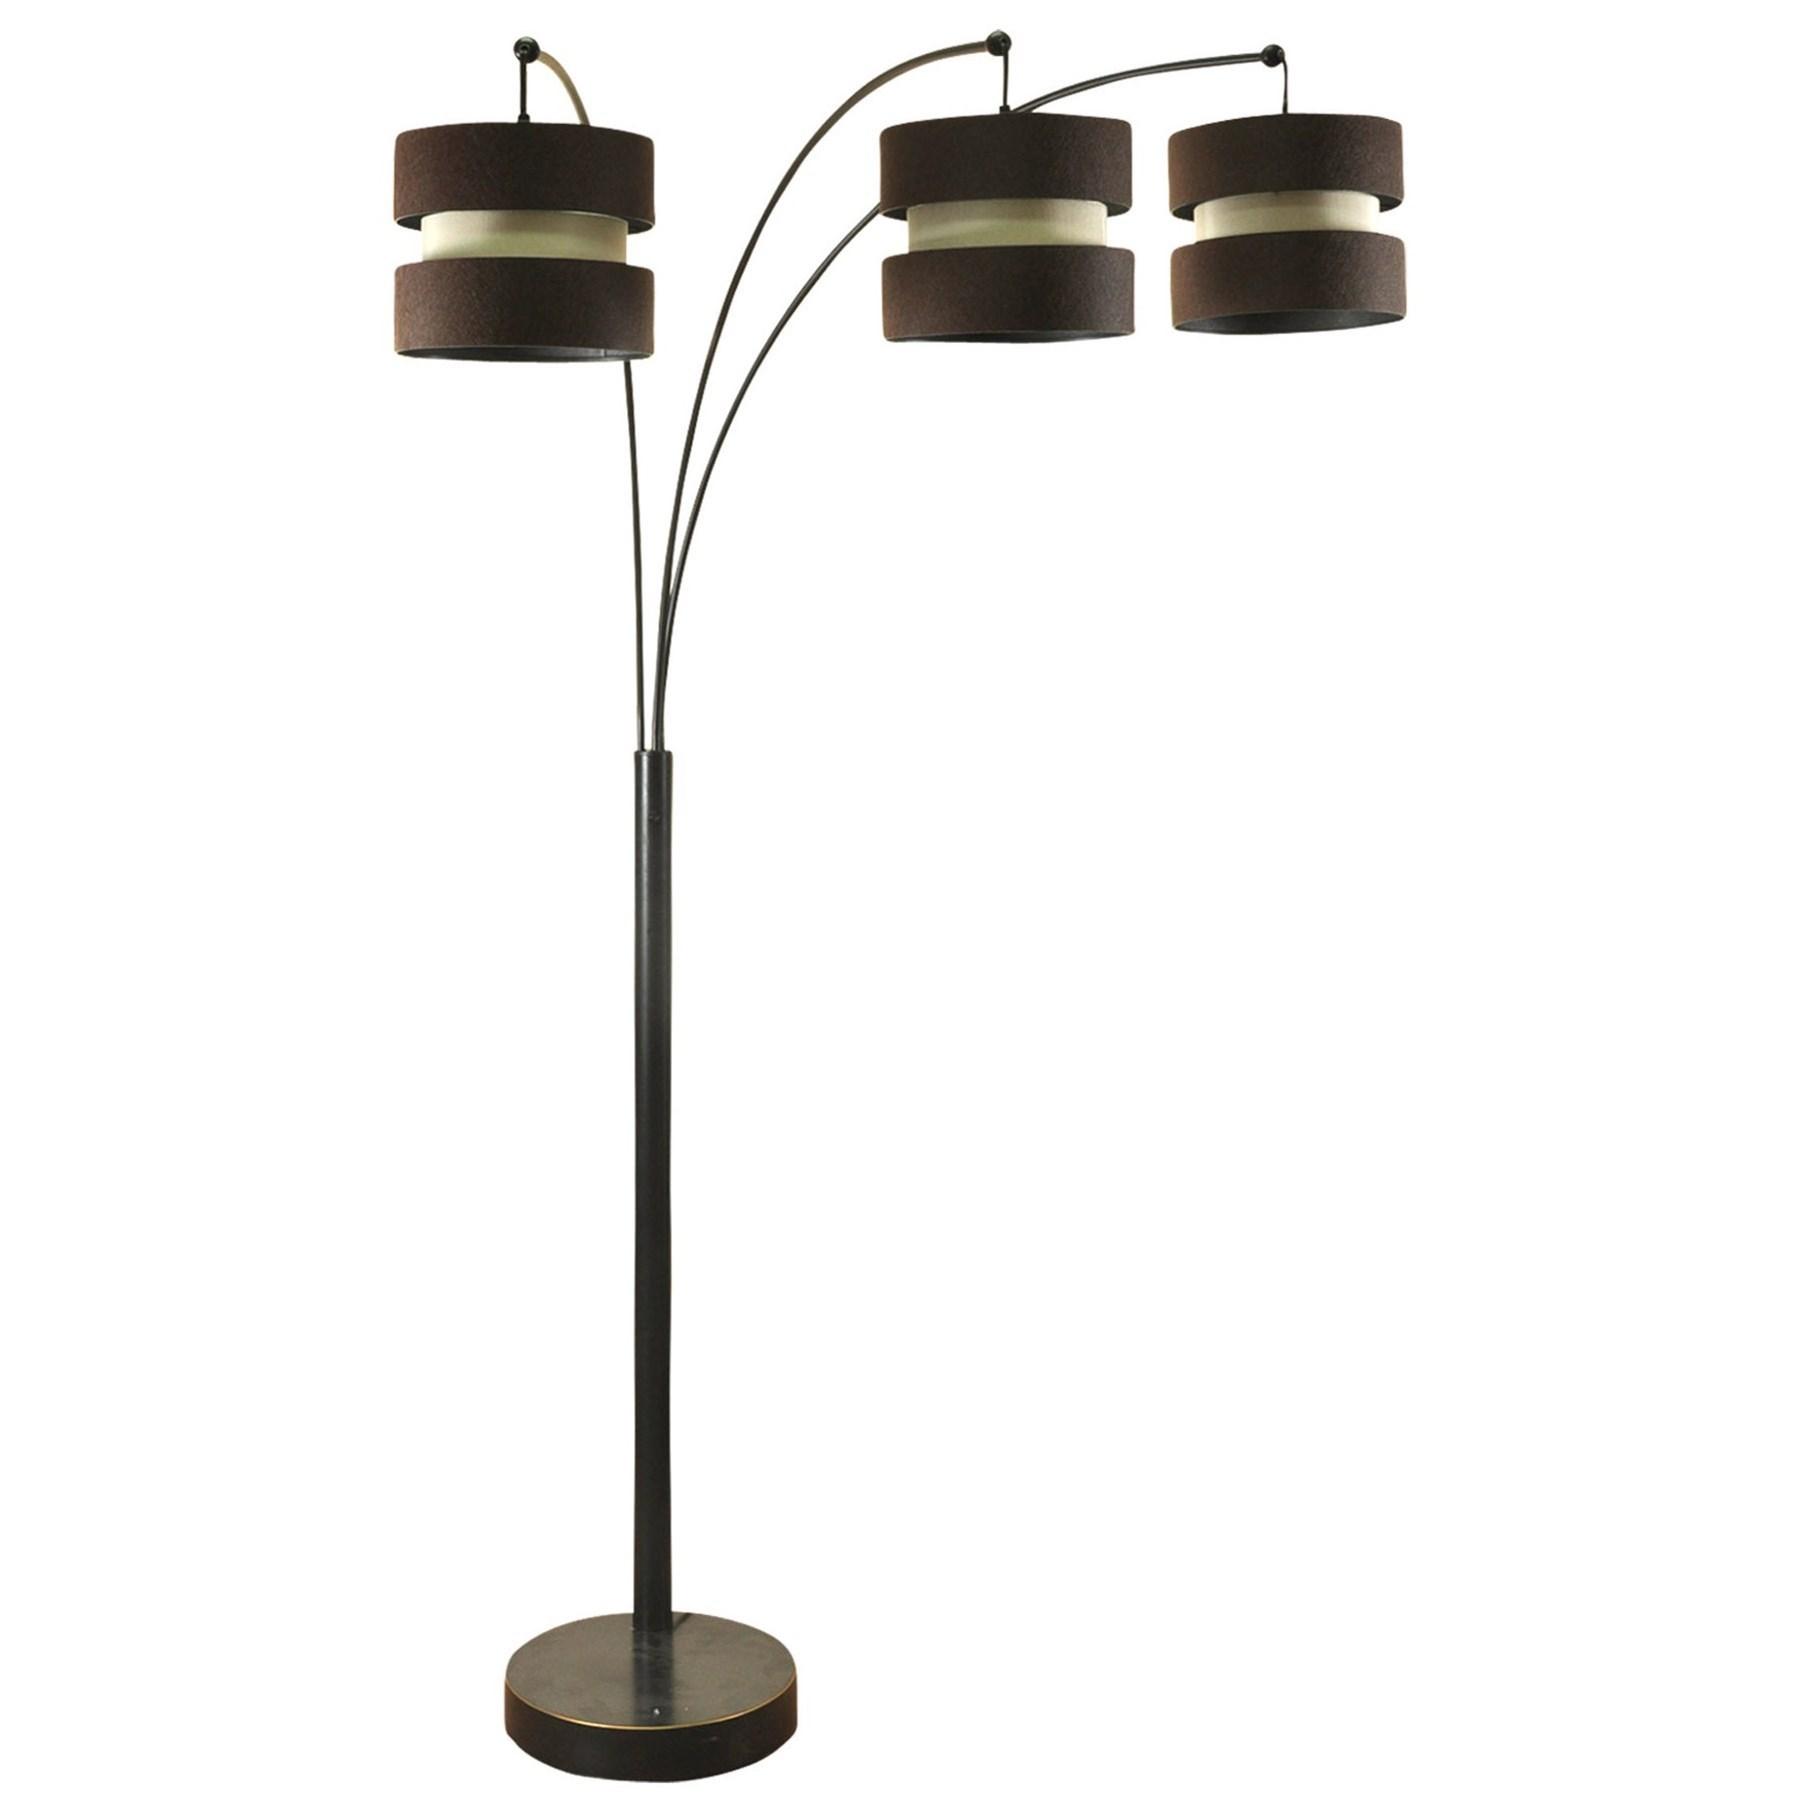 StyleCraft Lamps Madison Bronze 3 Arm Arch Floor Lamp